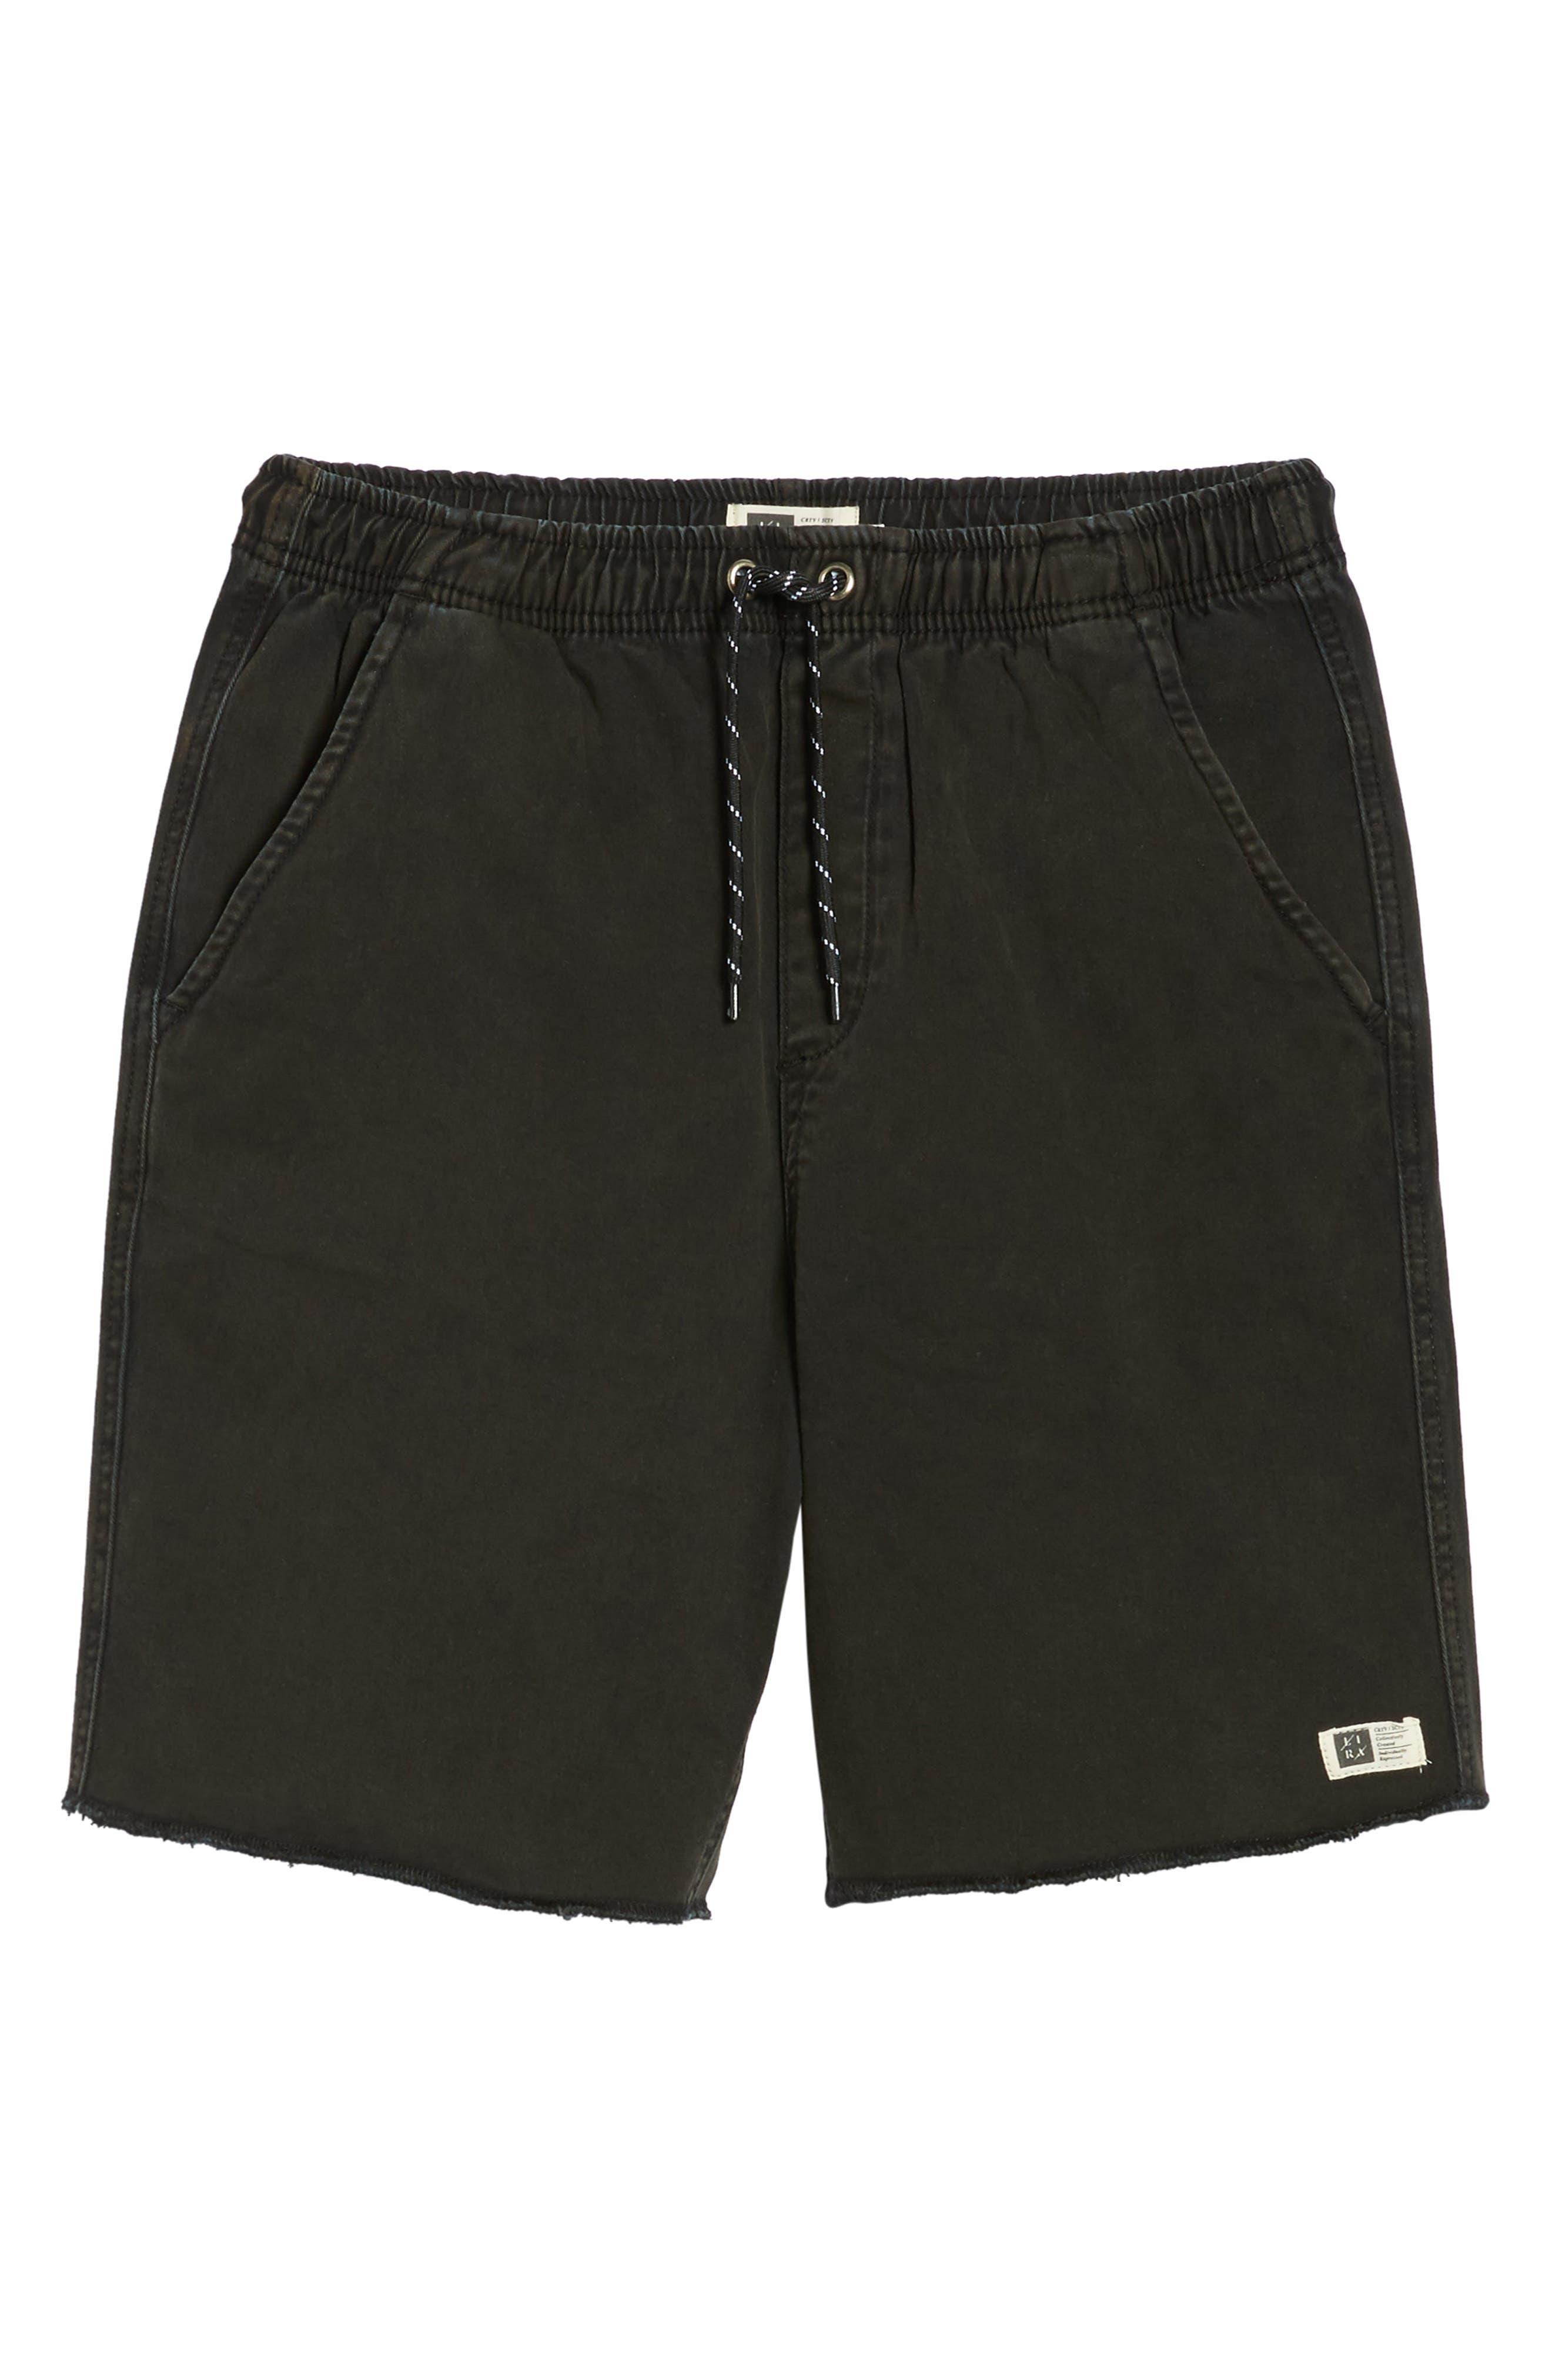 Frazier Walk Shorts,                             Alternate thumbnail 6, color,                             001